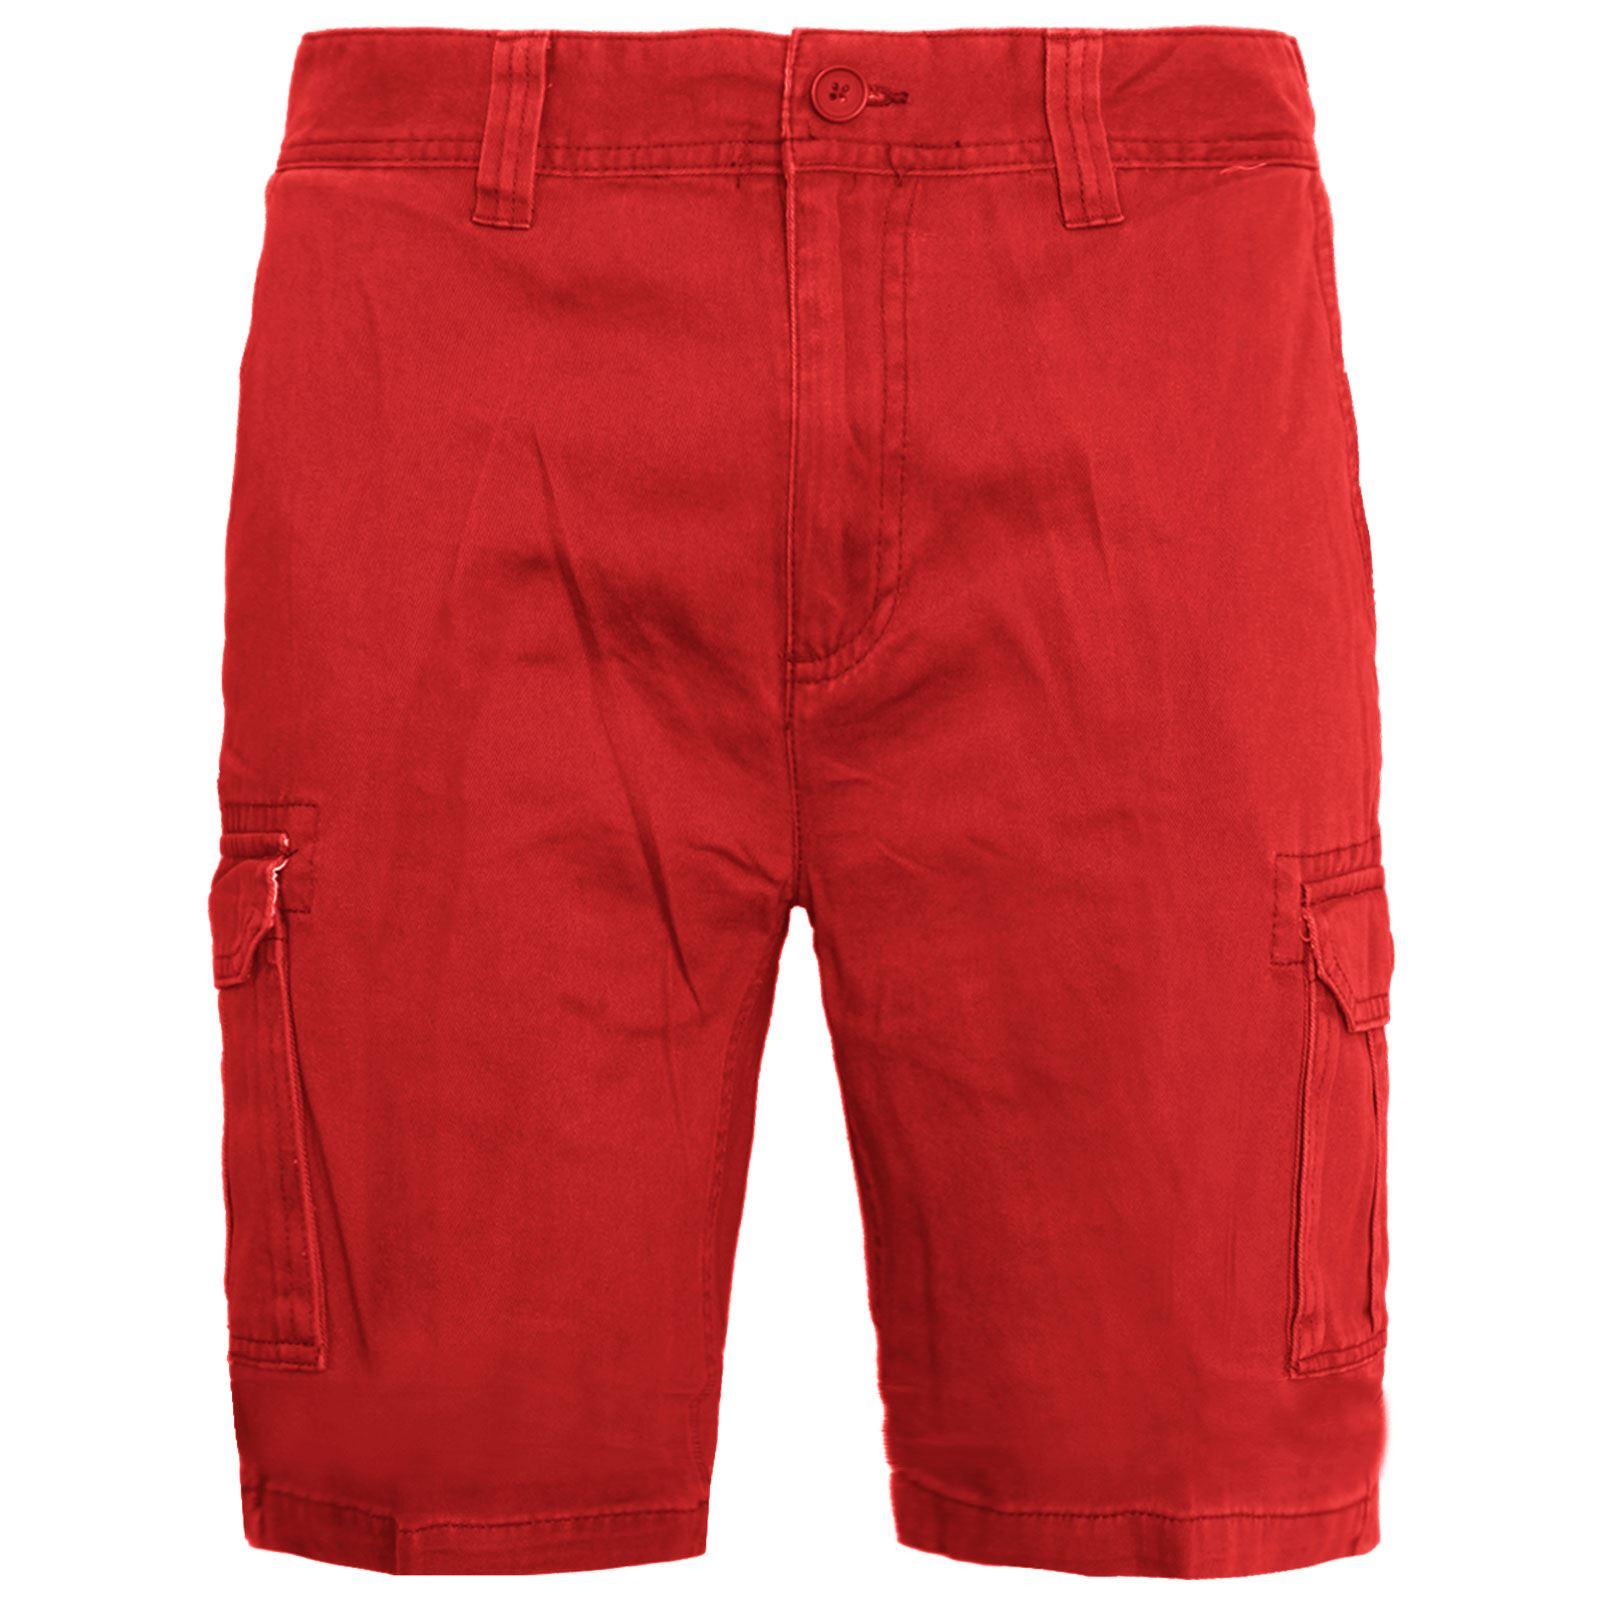 Mens-Multi-Pocket-Cargo-Shorts-Combat-Chino-Half-Pants-100-Cotton-Work-30-46 thumbnail 17